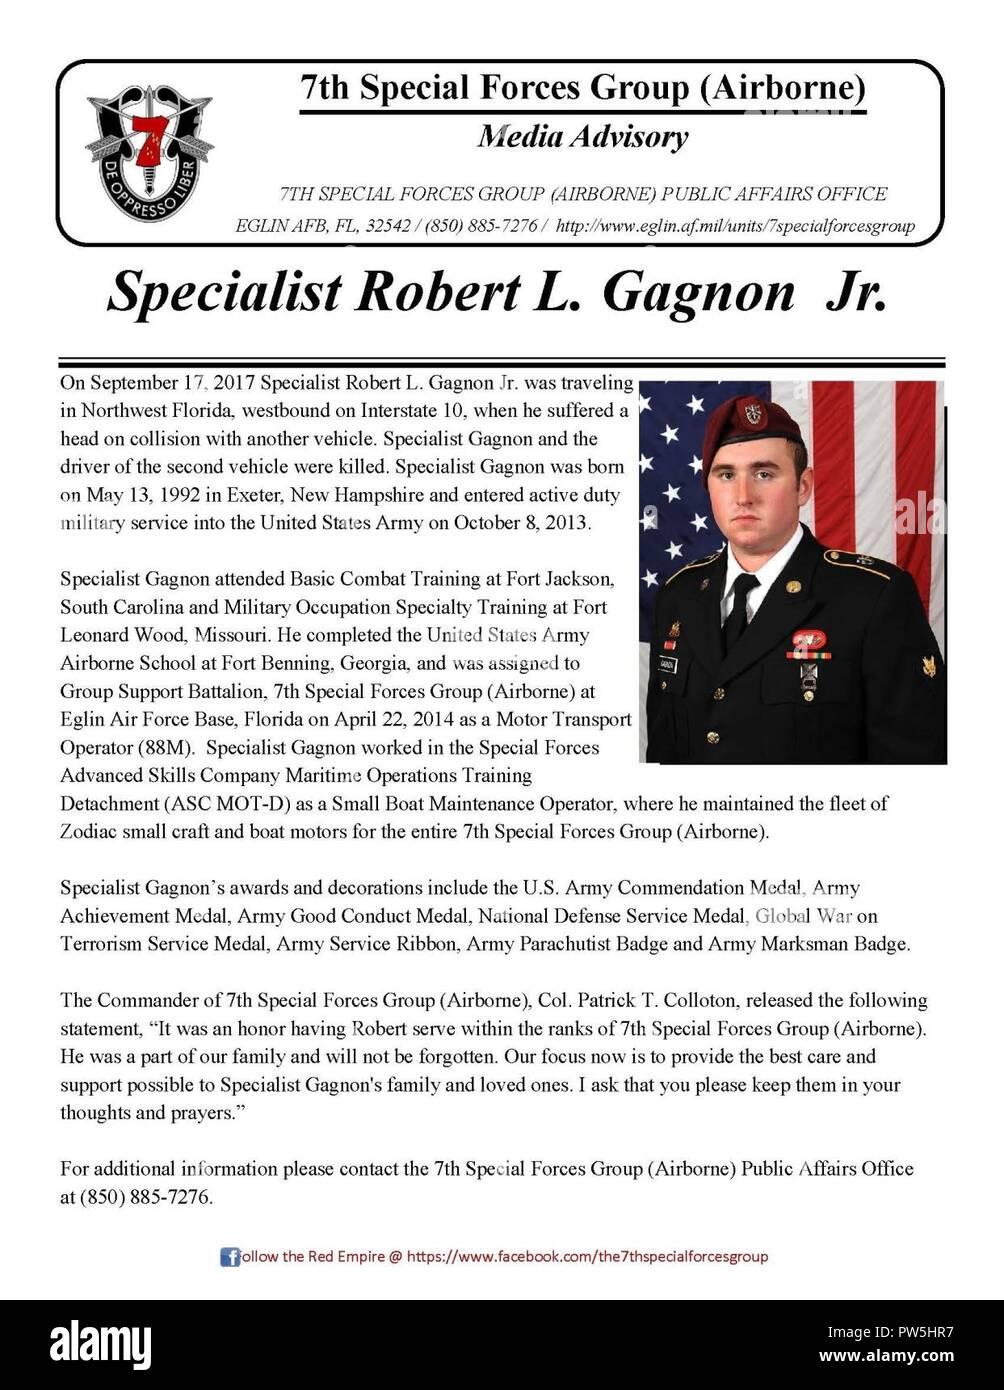 Media Advisory: Specialist Robert L. Gagnon Jr. Stock Photo